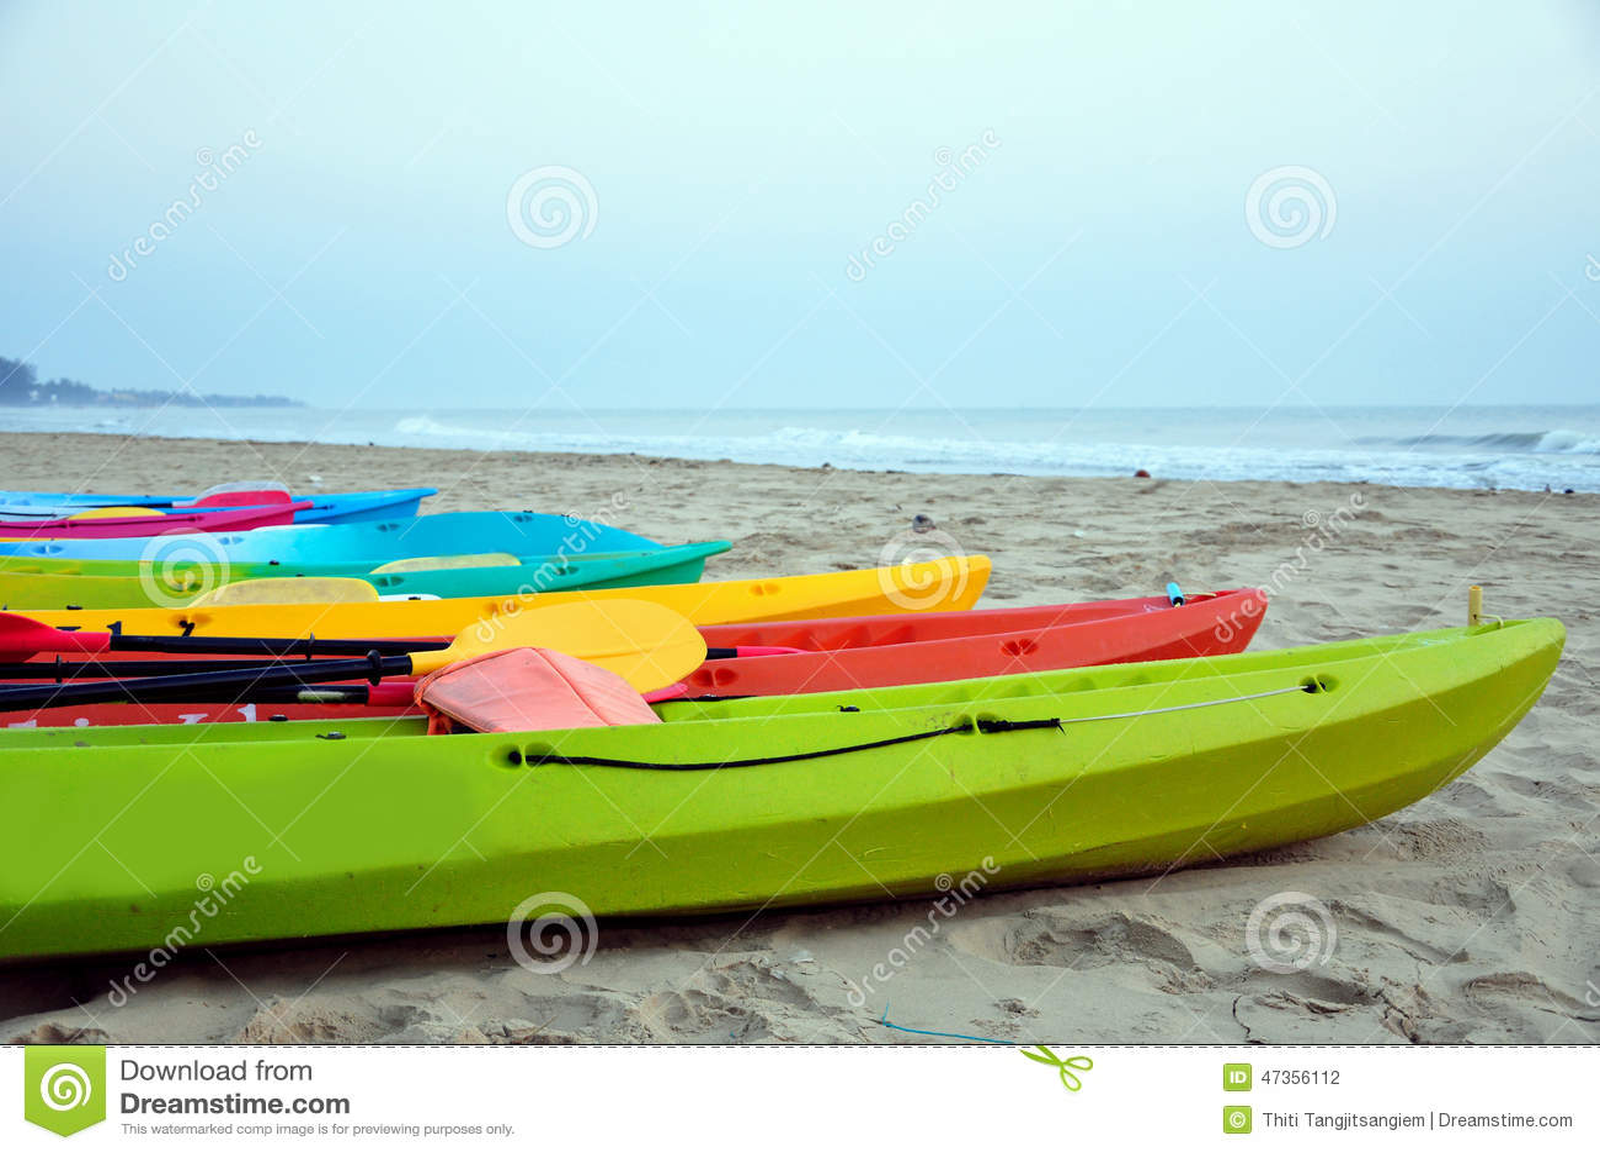 Kayak In The Beach Stock Photo  Image 47356112